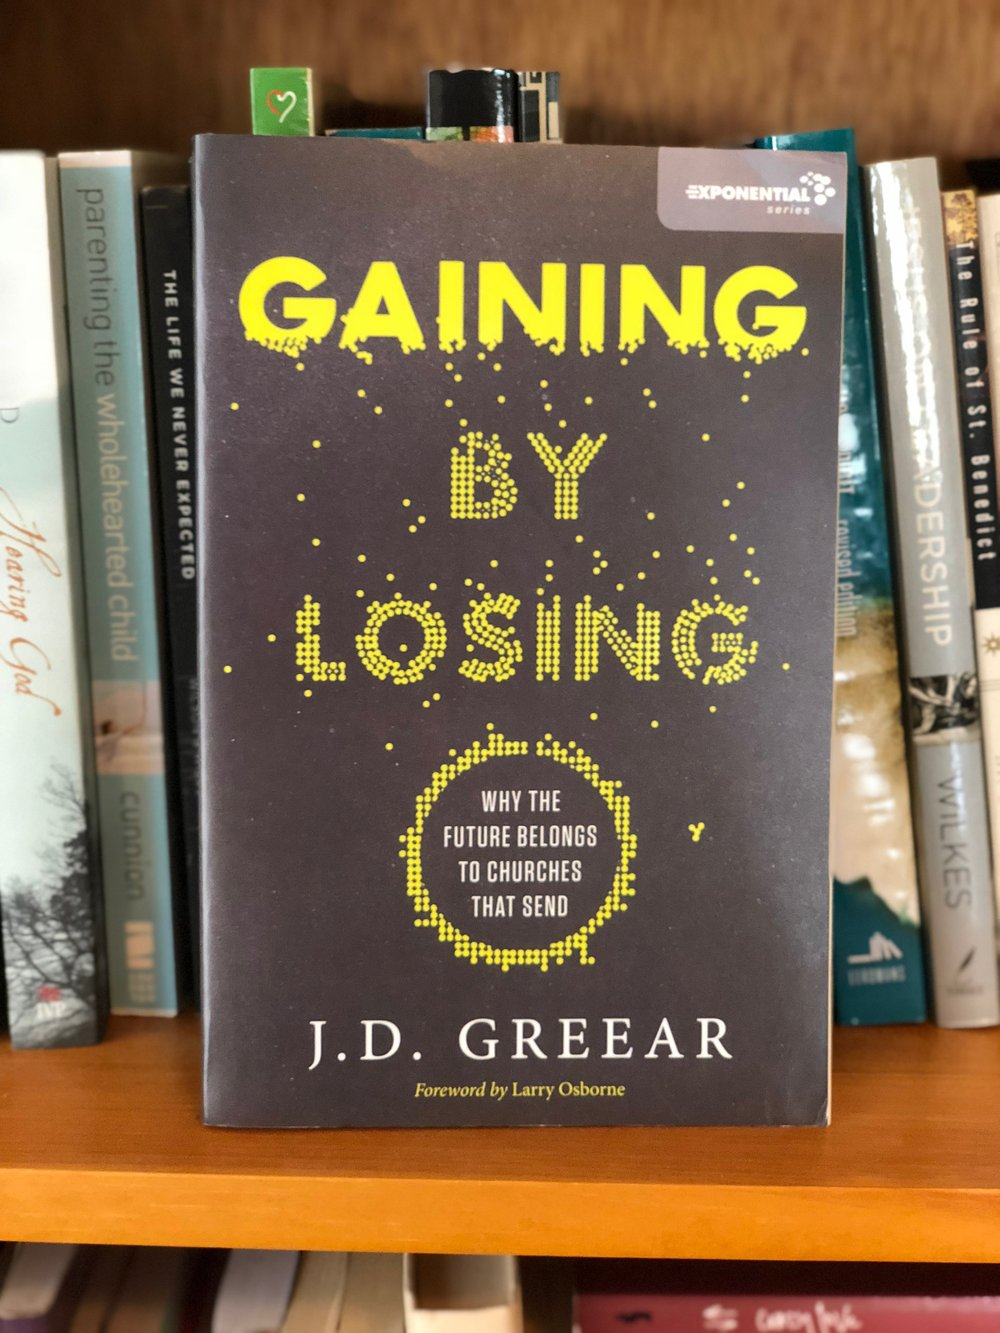 Gaining by Losing - J.D. Greear